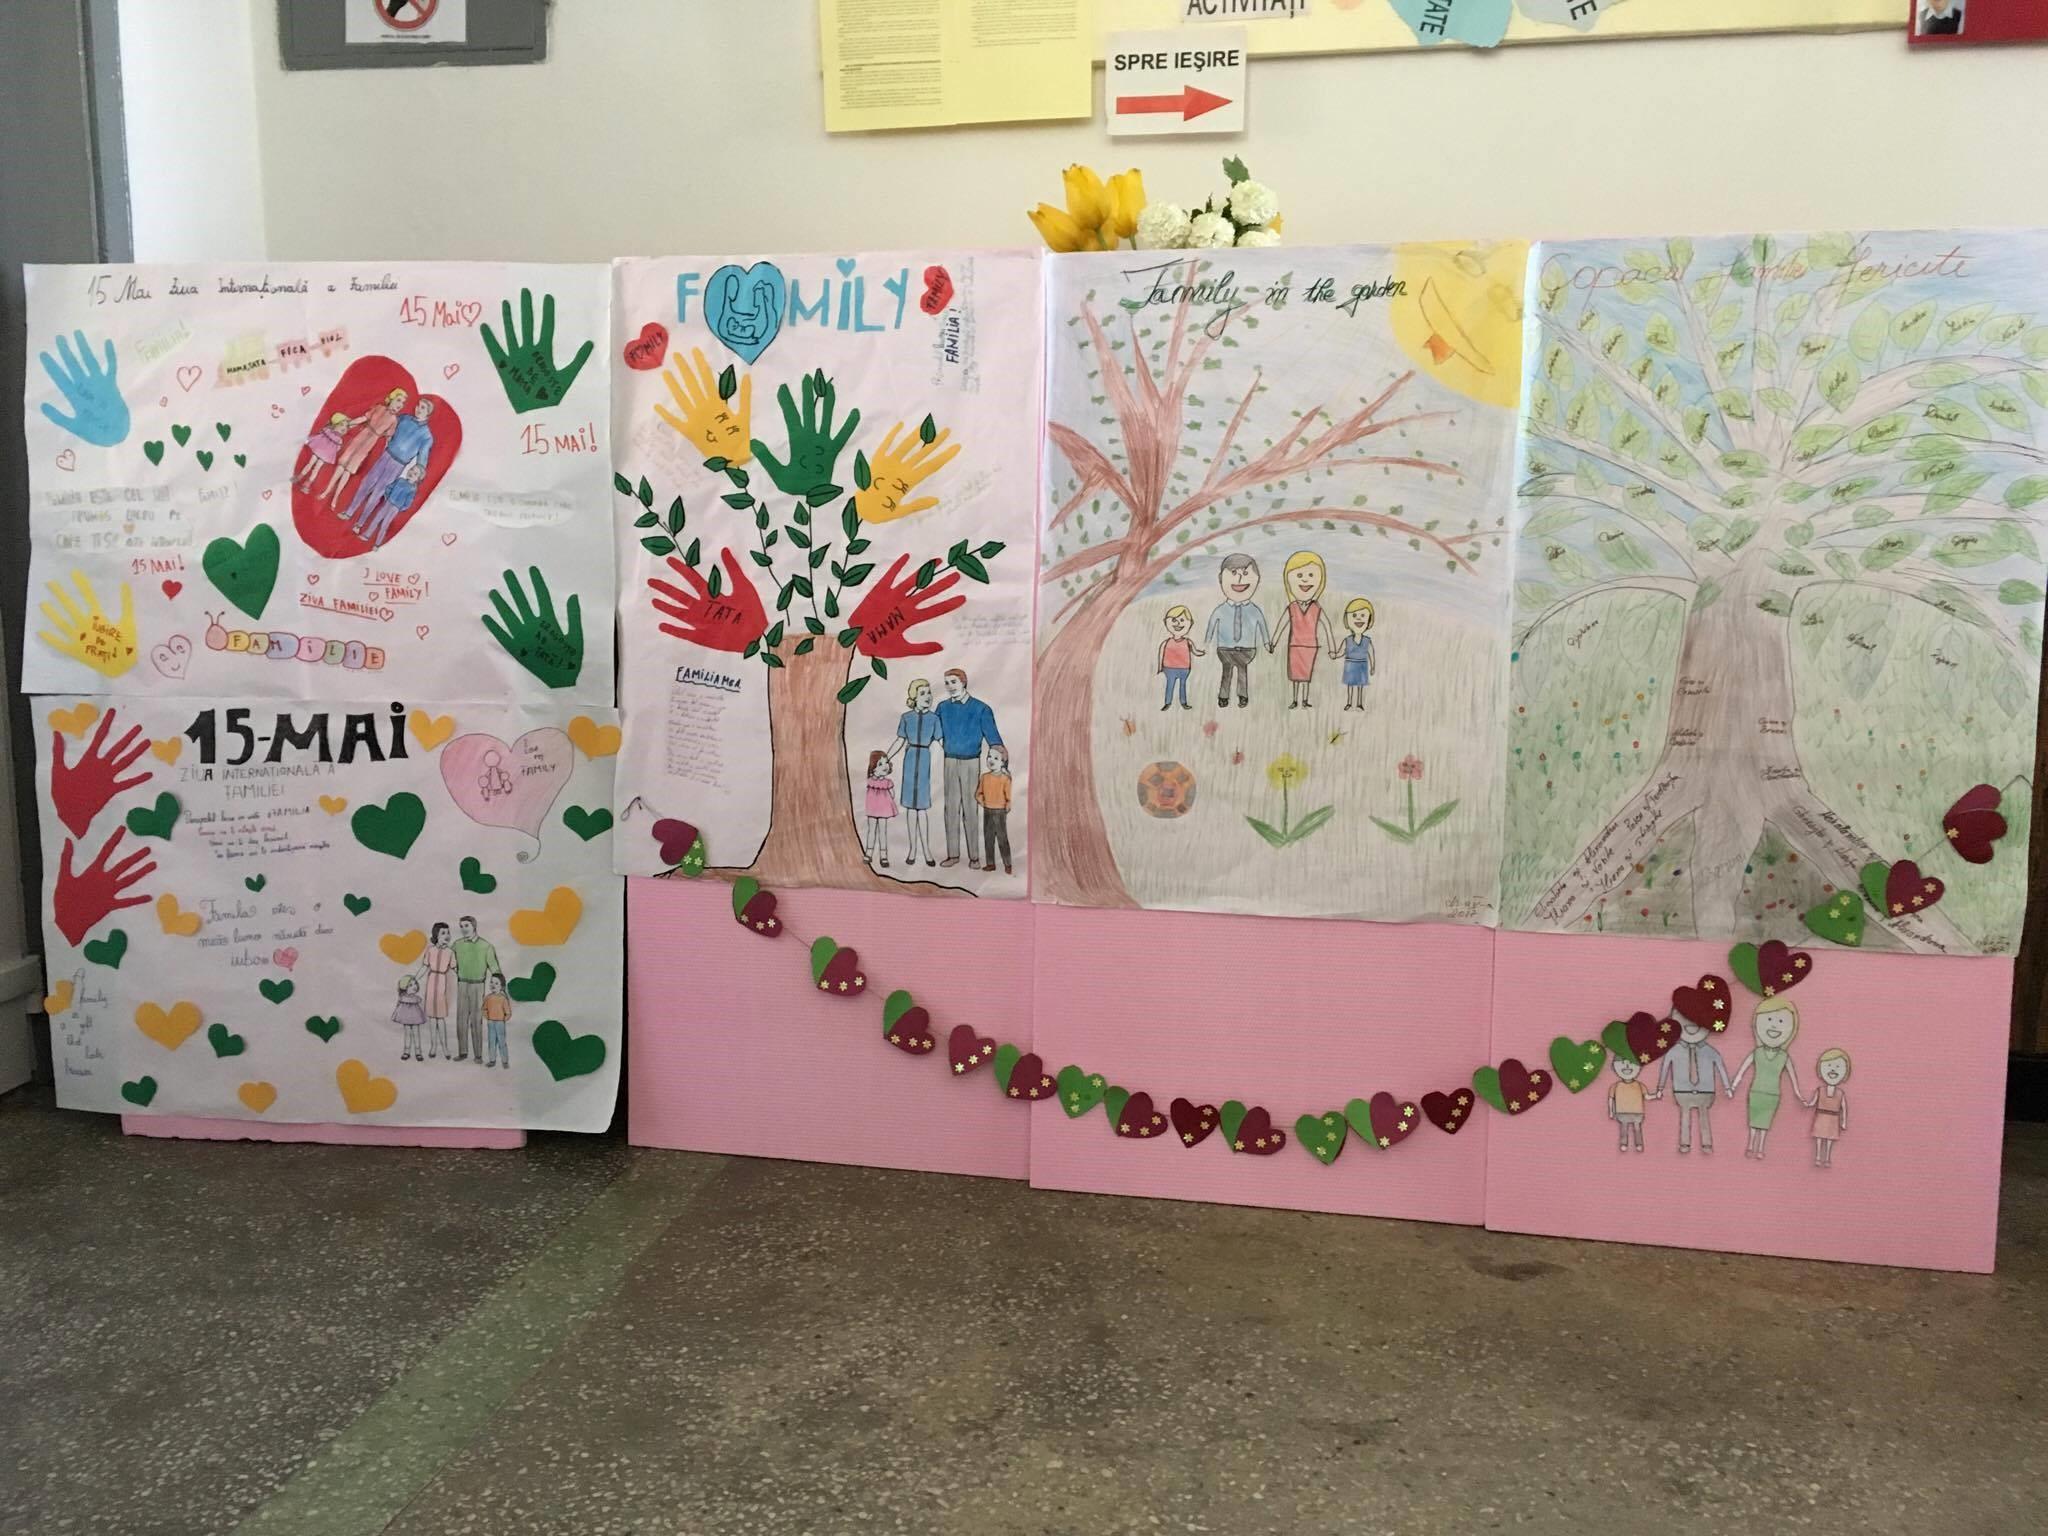 Proiect scoala familie comunitate